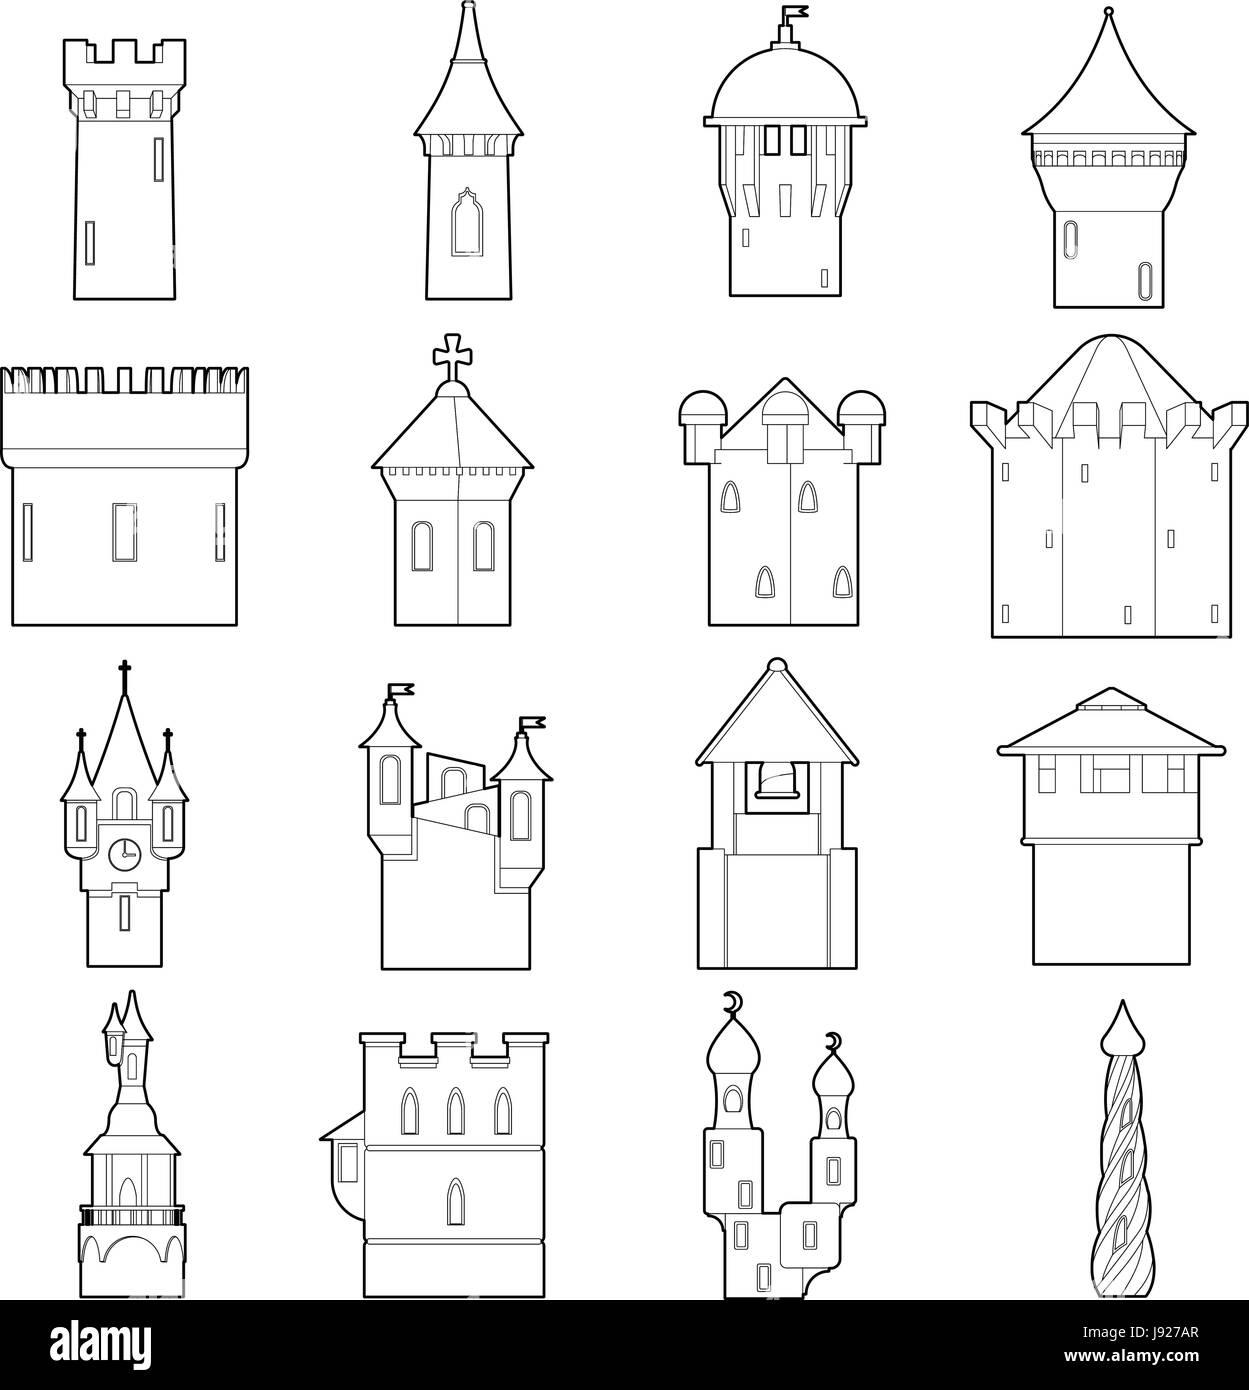 castle tower icons set color outline style J927AR castle tower icons set color, outline style stock vector art